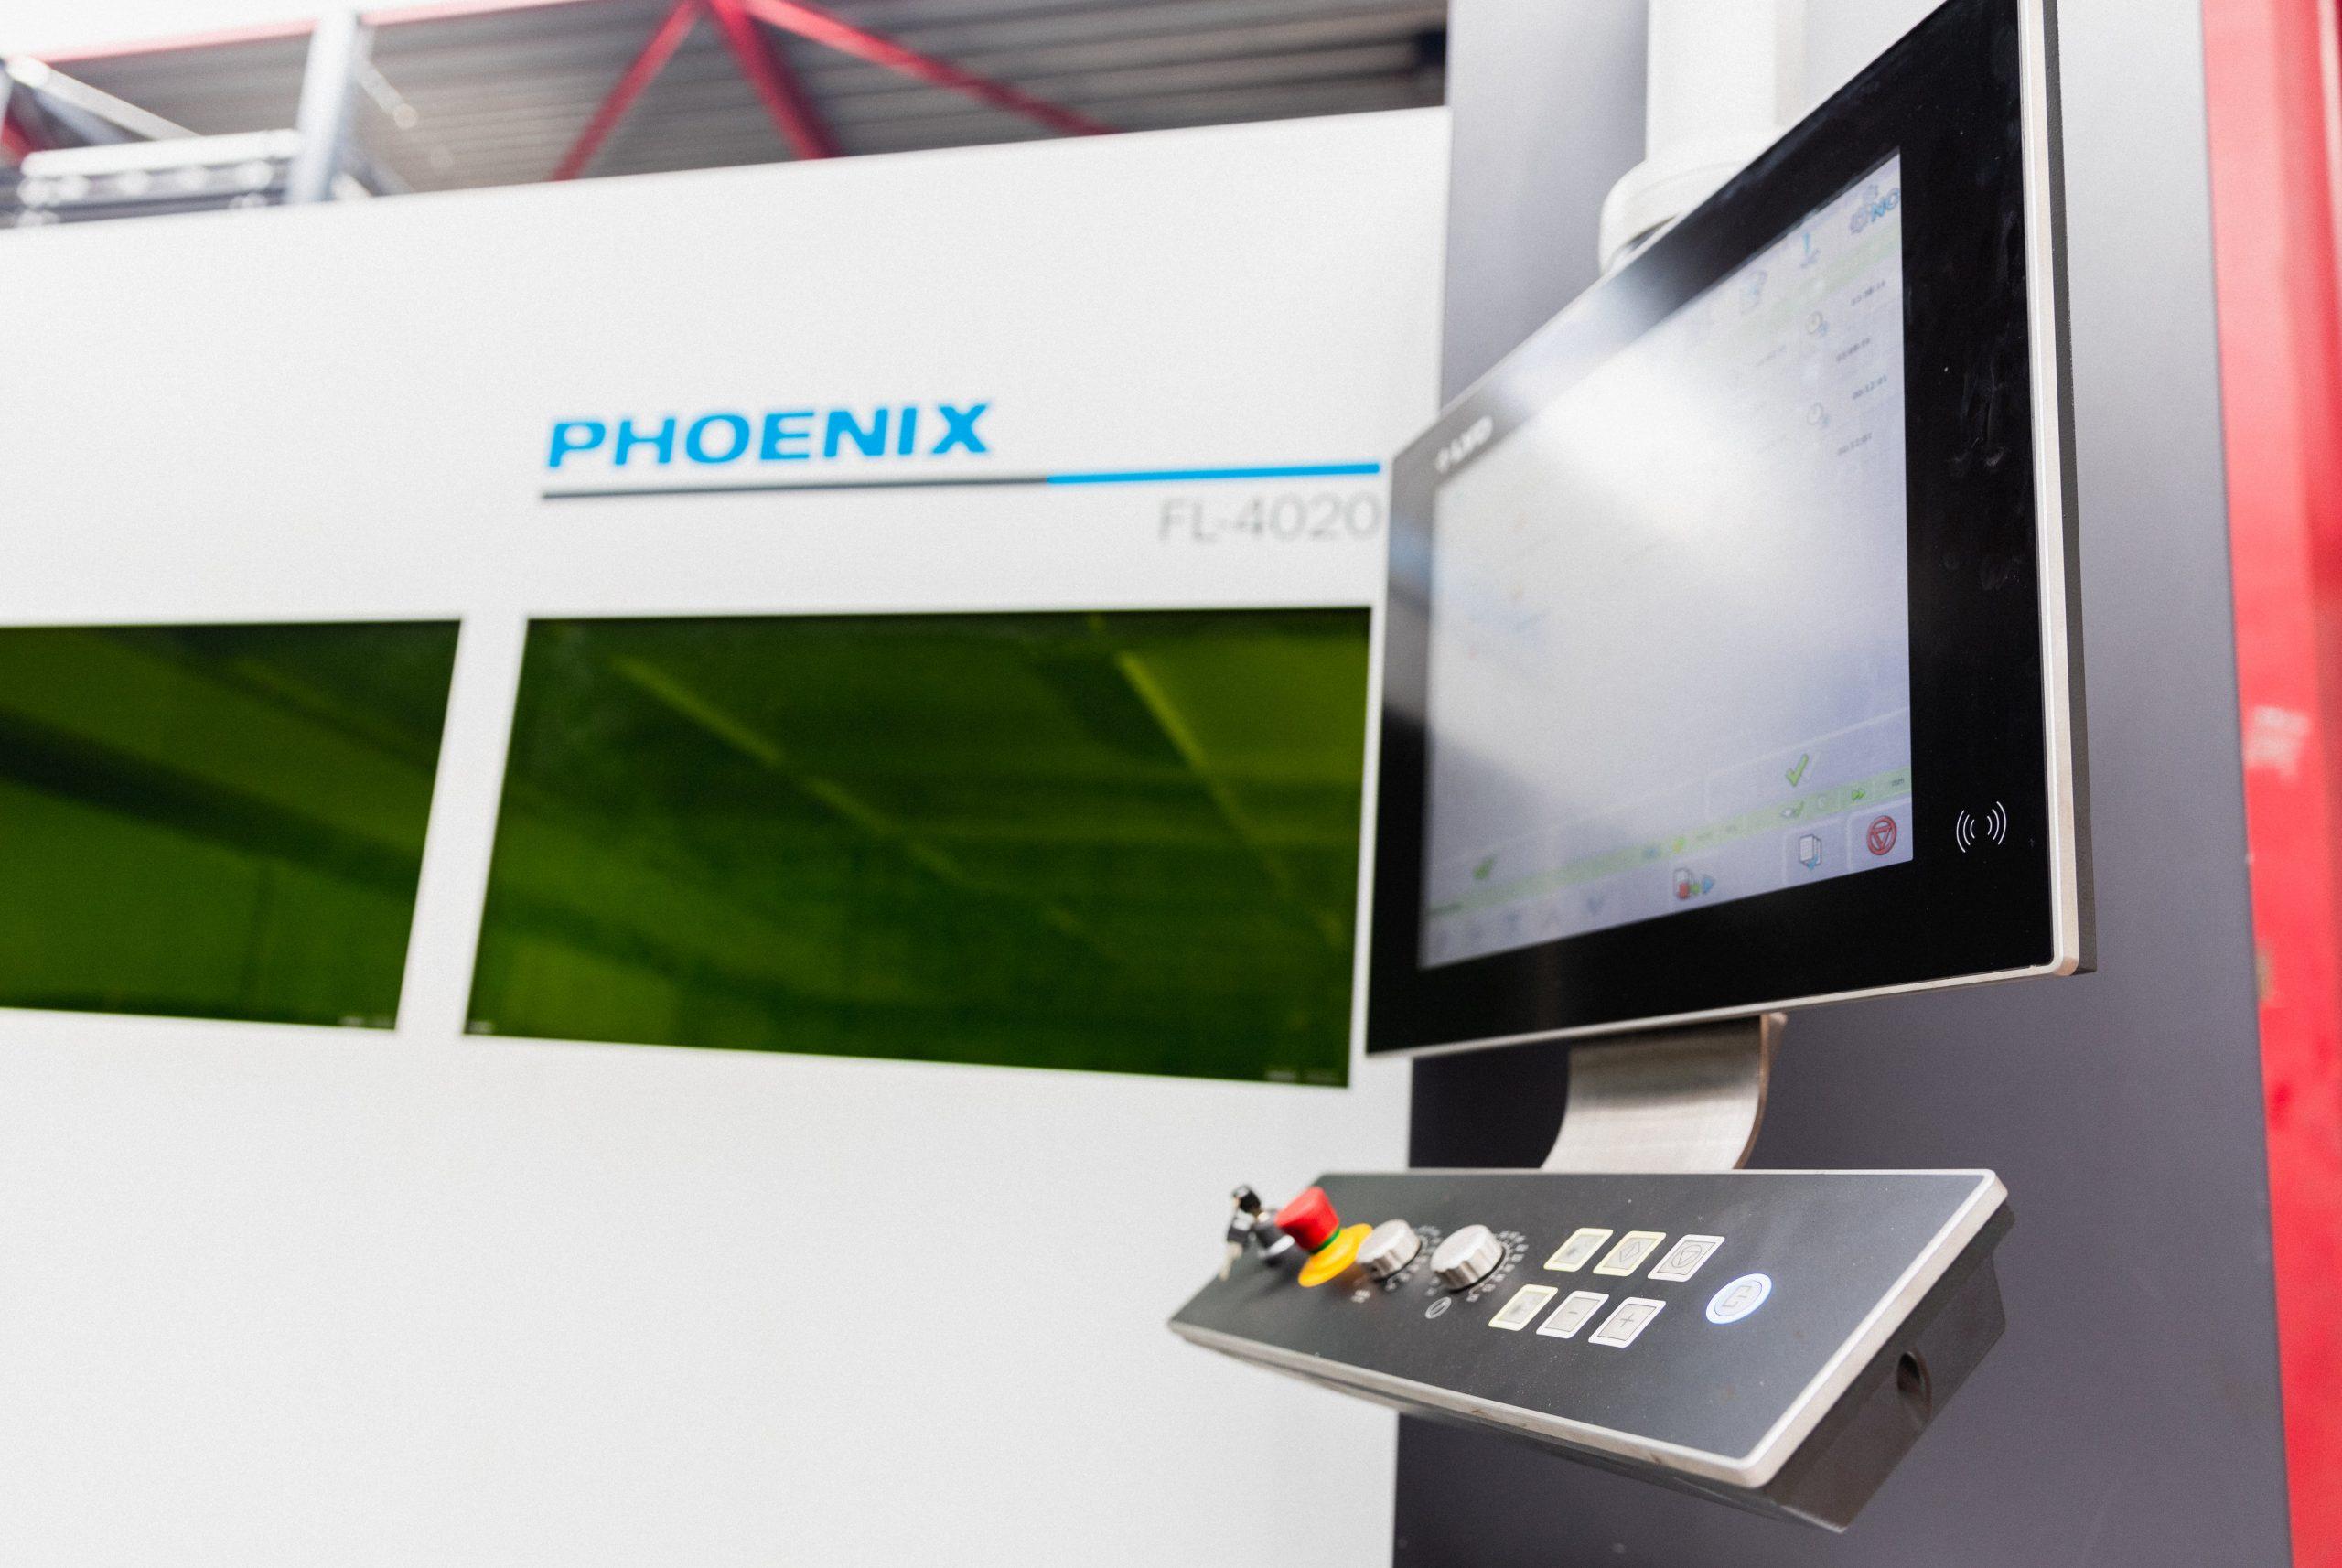 Lasersnijden Snelheid Delwi Groenink